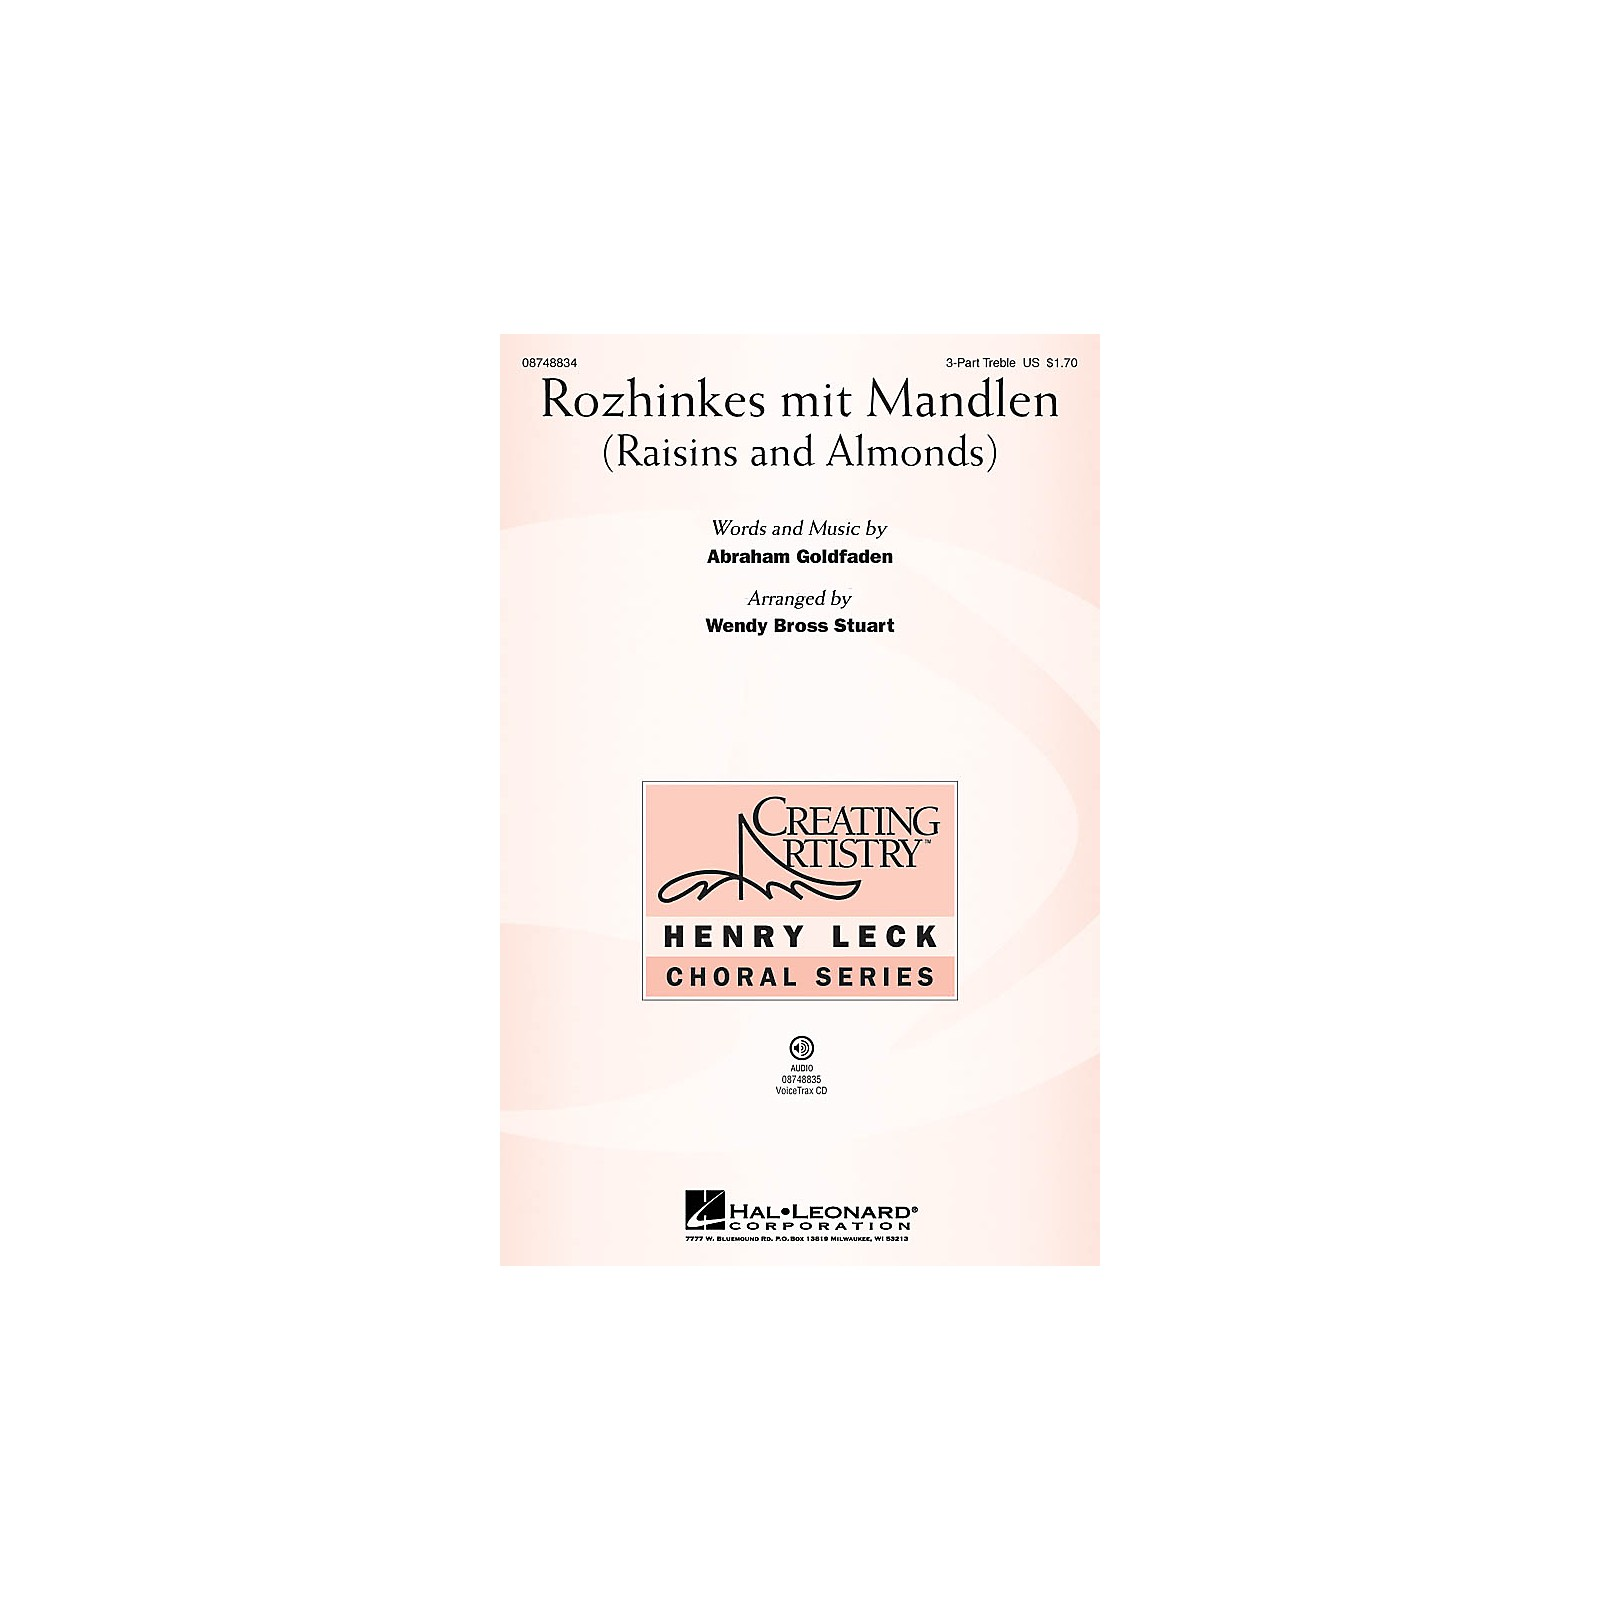 Hal Leonard Rozhinkes mit Mandlen VoiceTrax CD Arranged by Wendy Bross Stuart